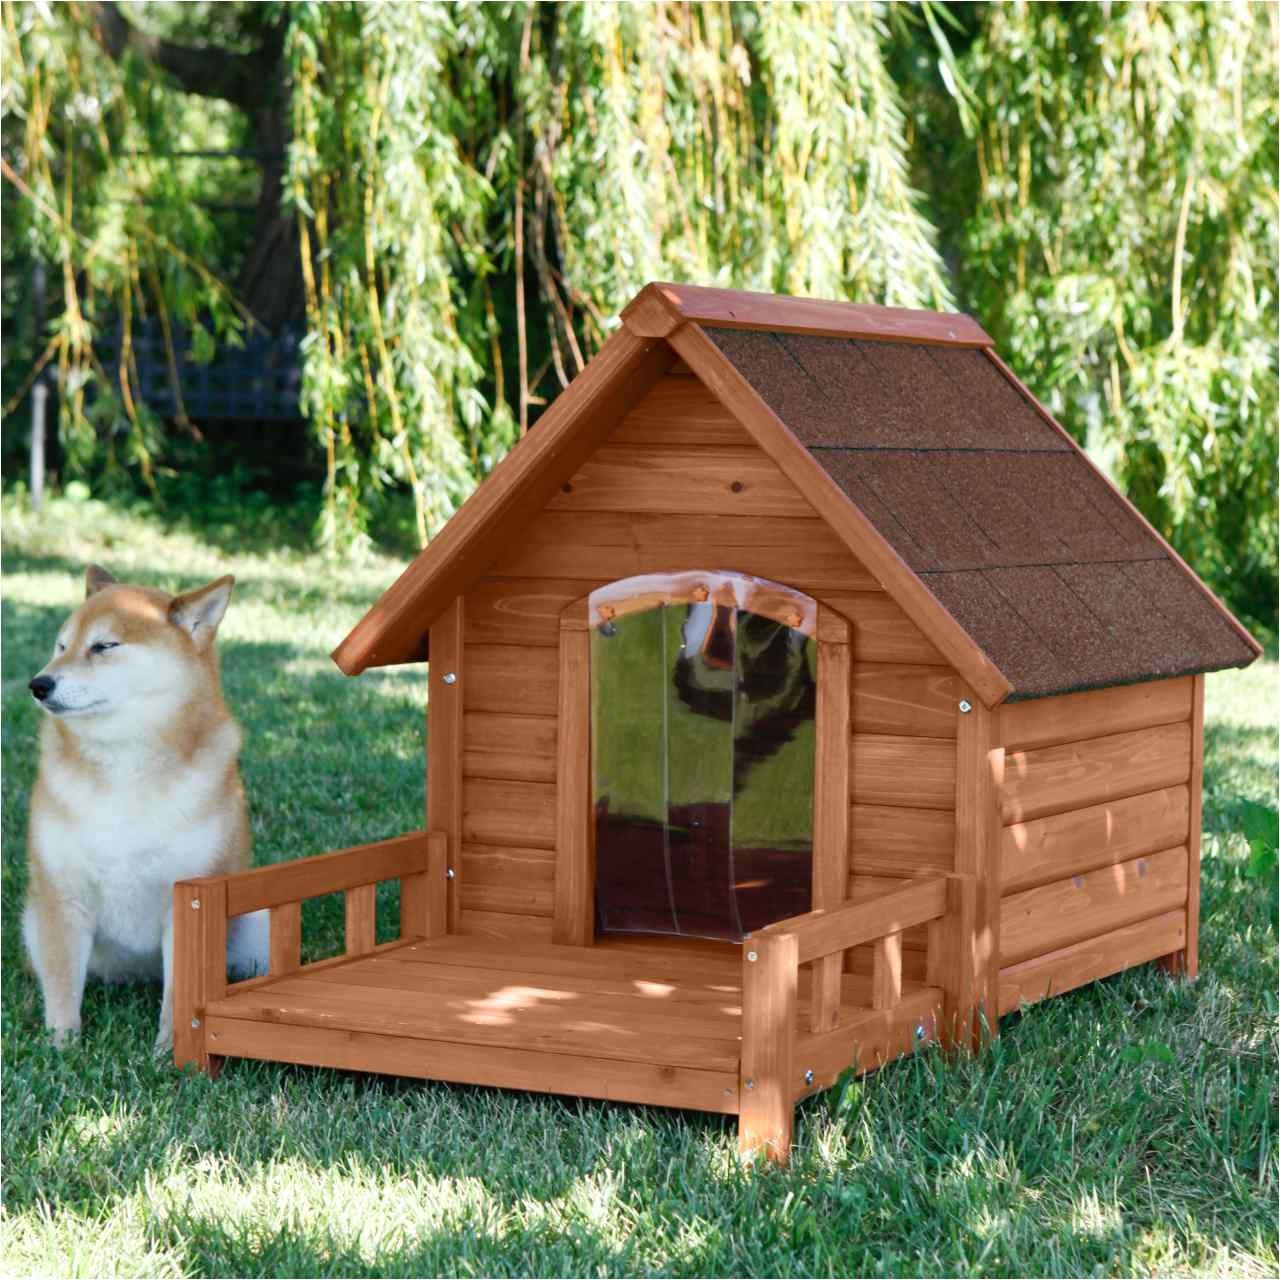 heated dog house plans beautiful homemade dog house ideas dog